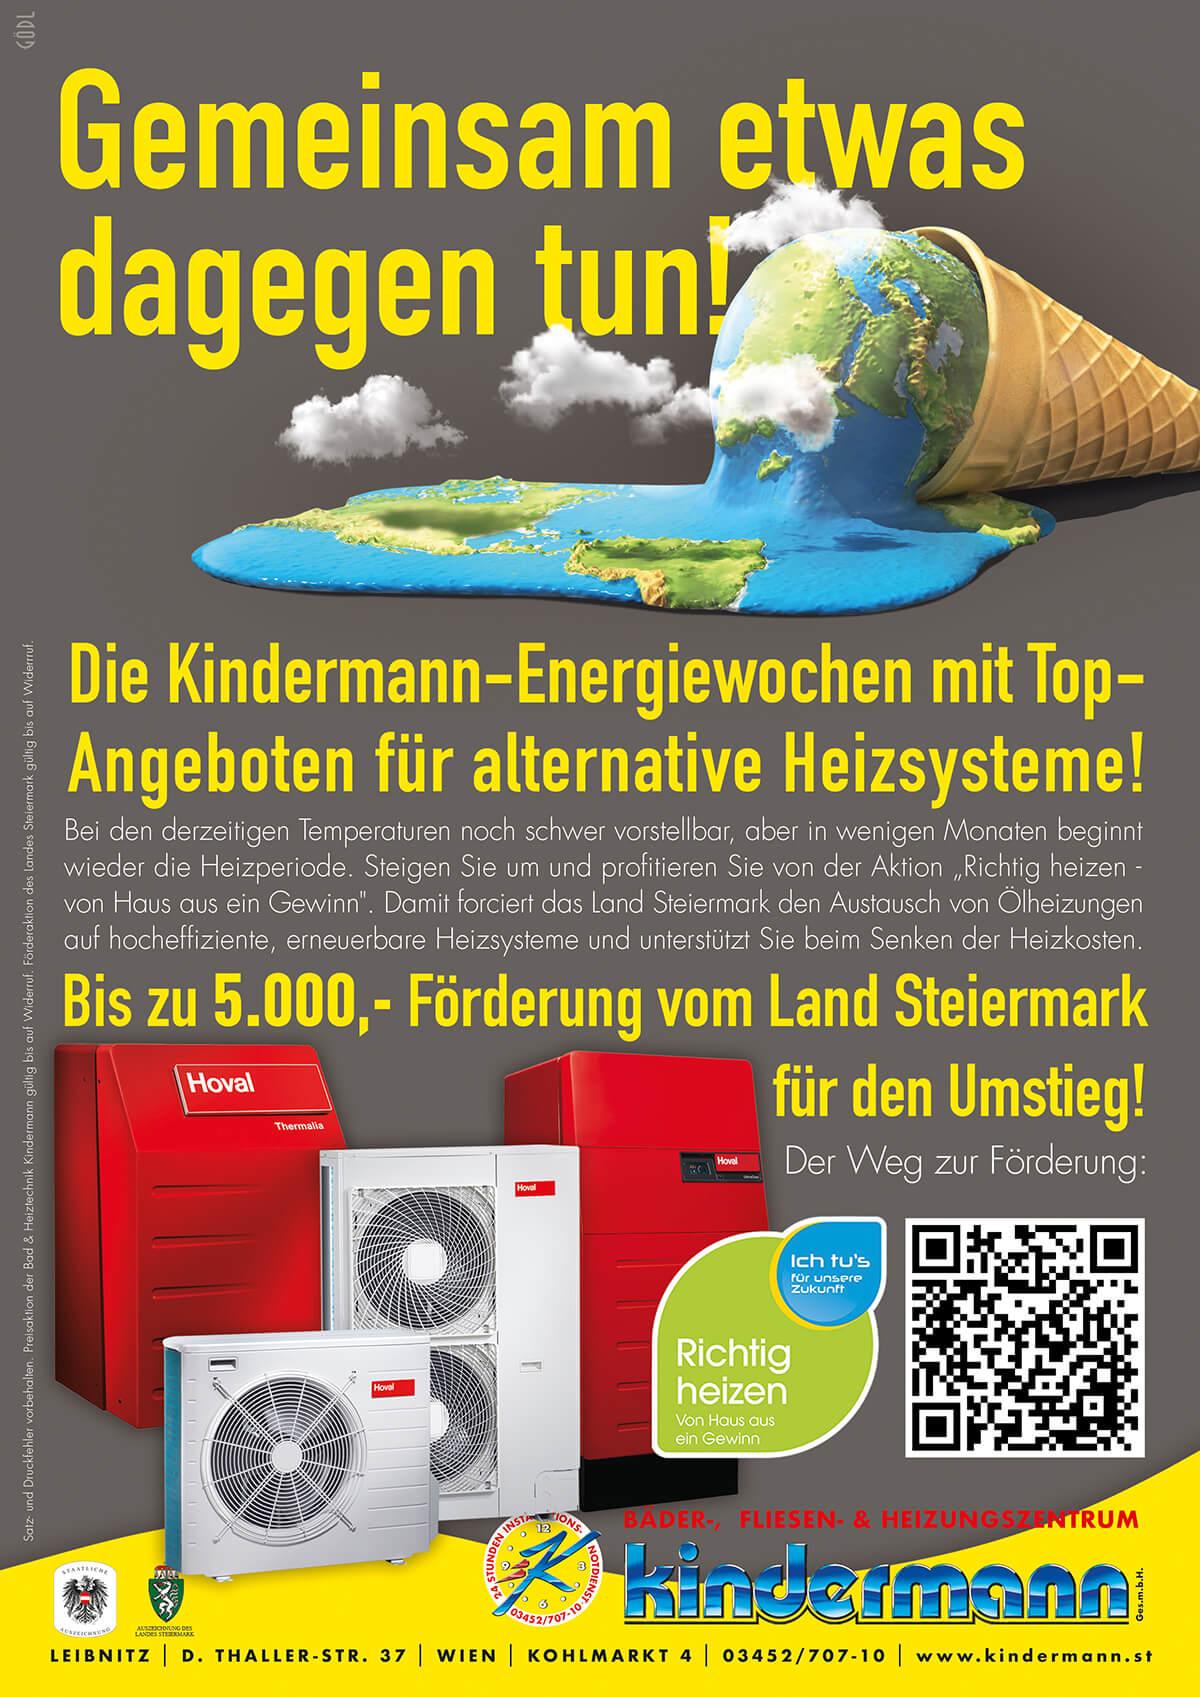 Kindermann-Energiewochen